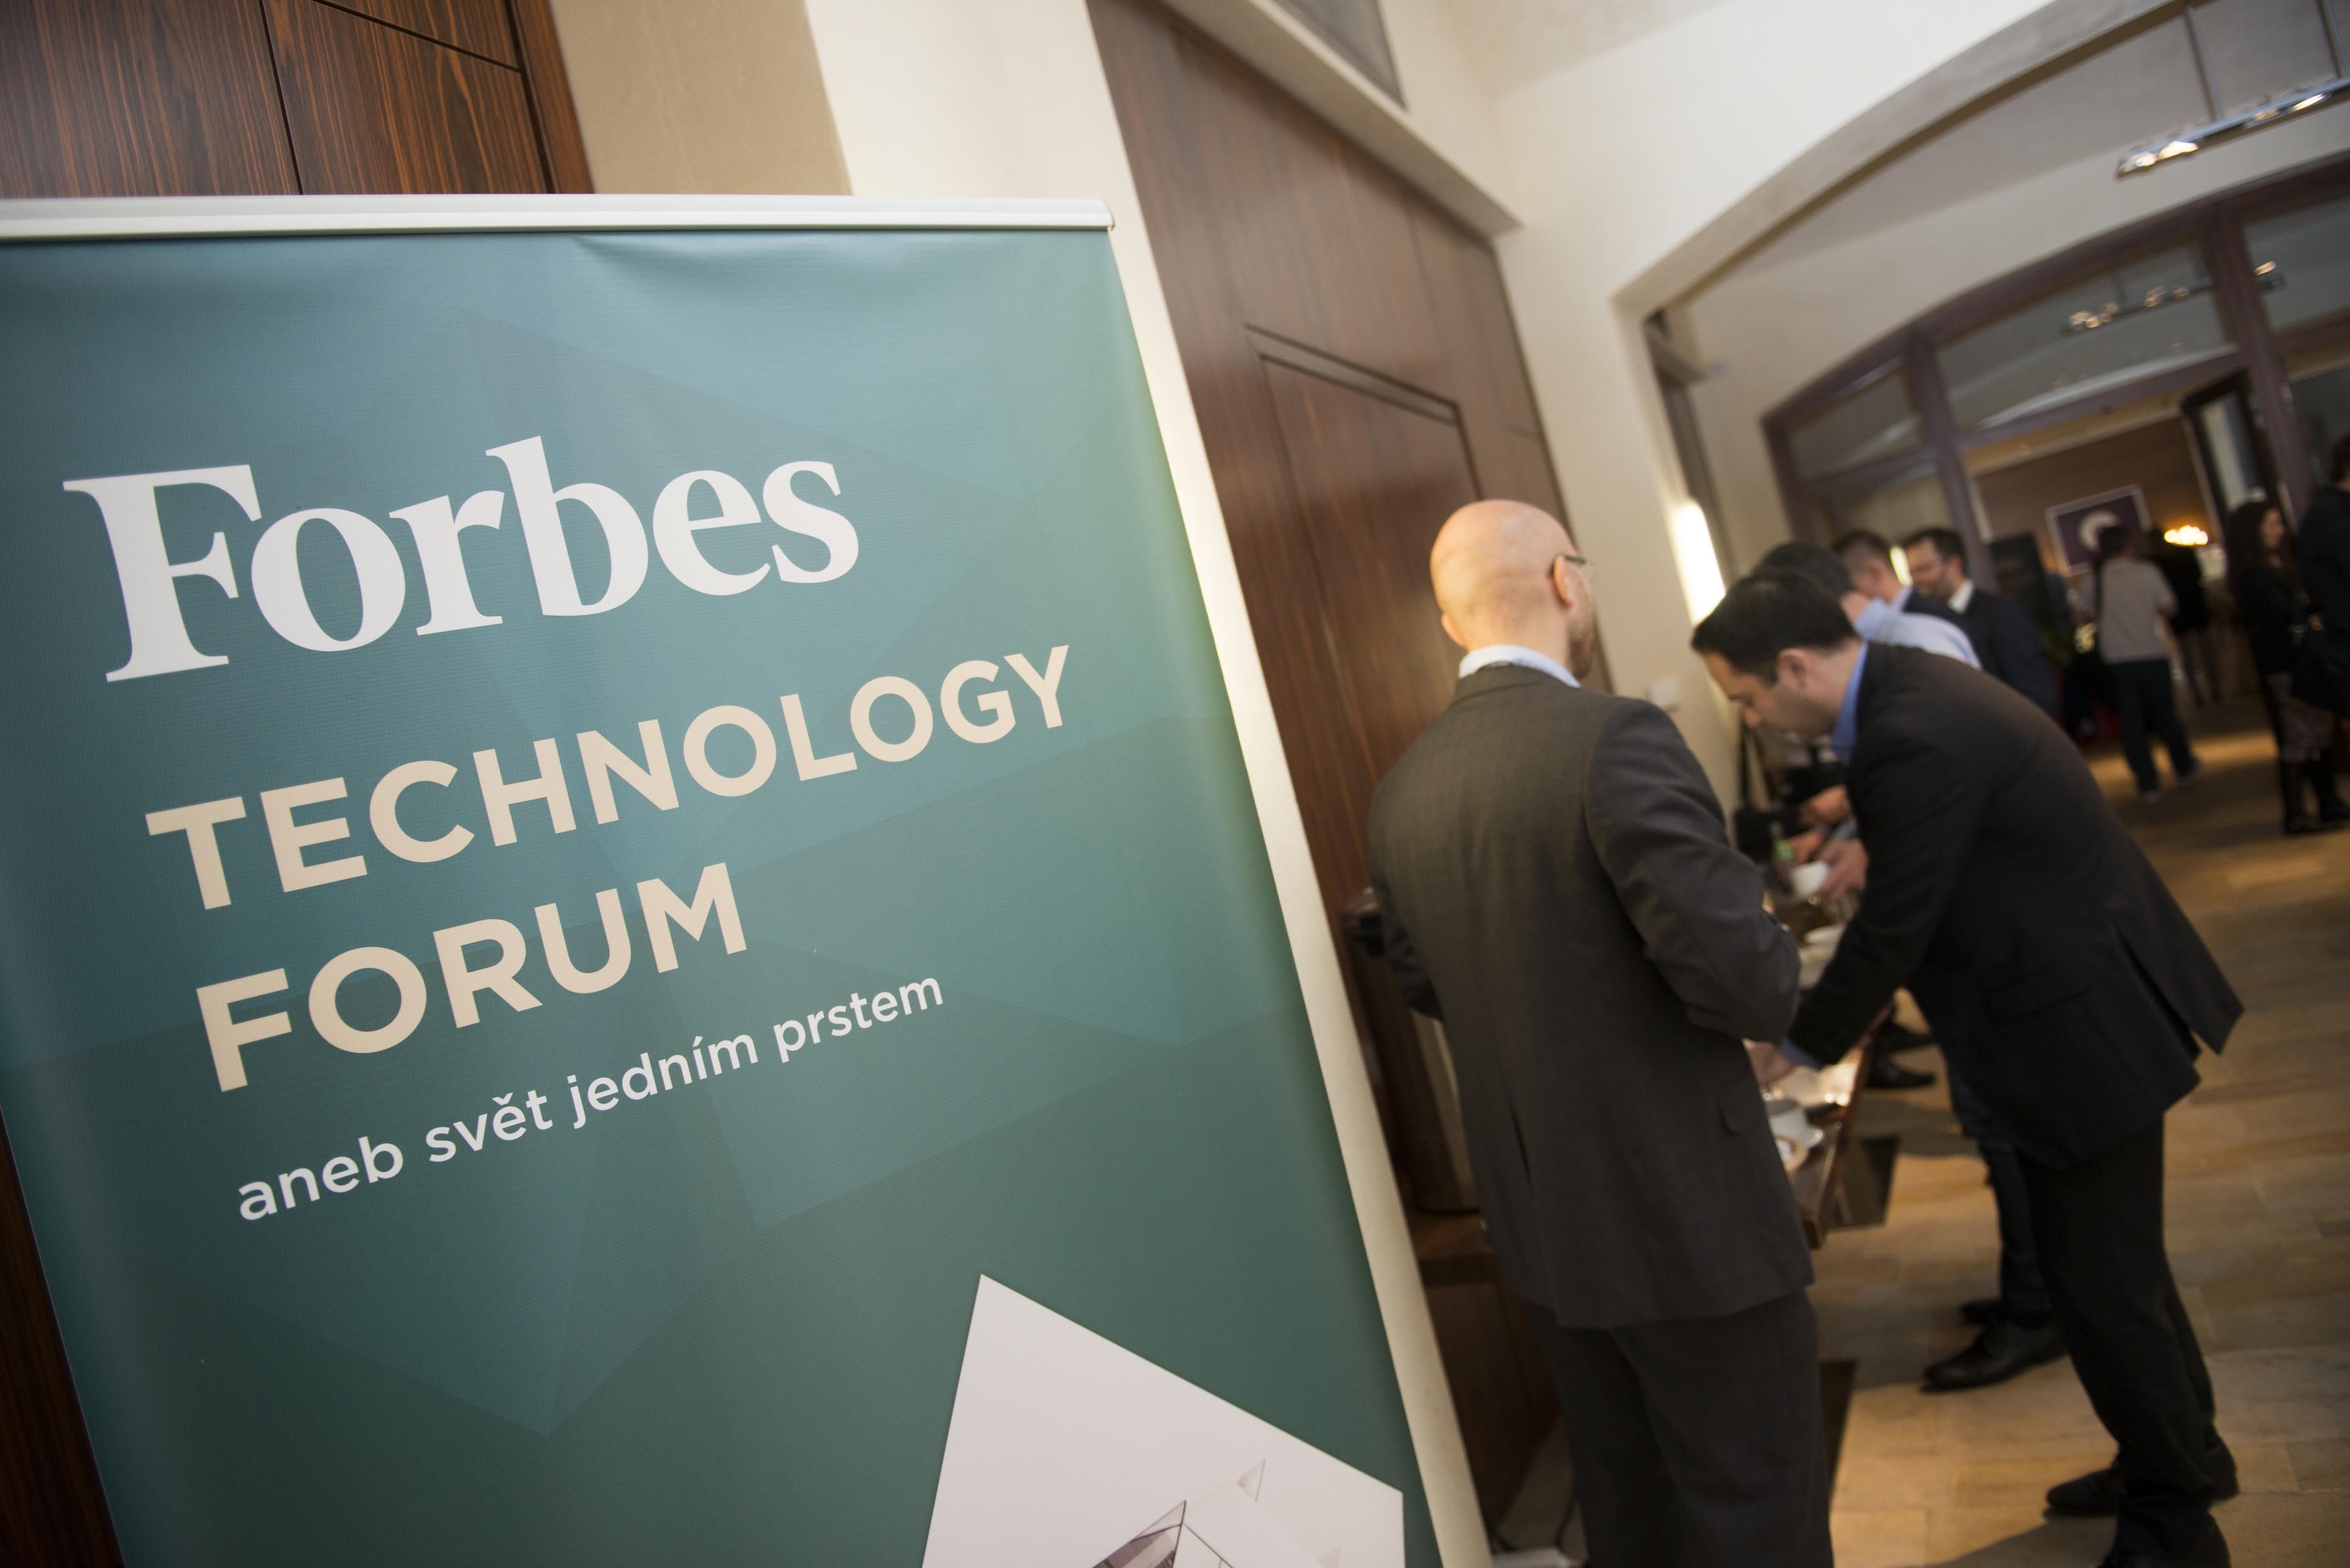 technology_forum4 (8)